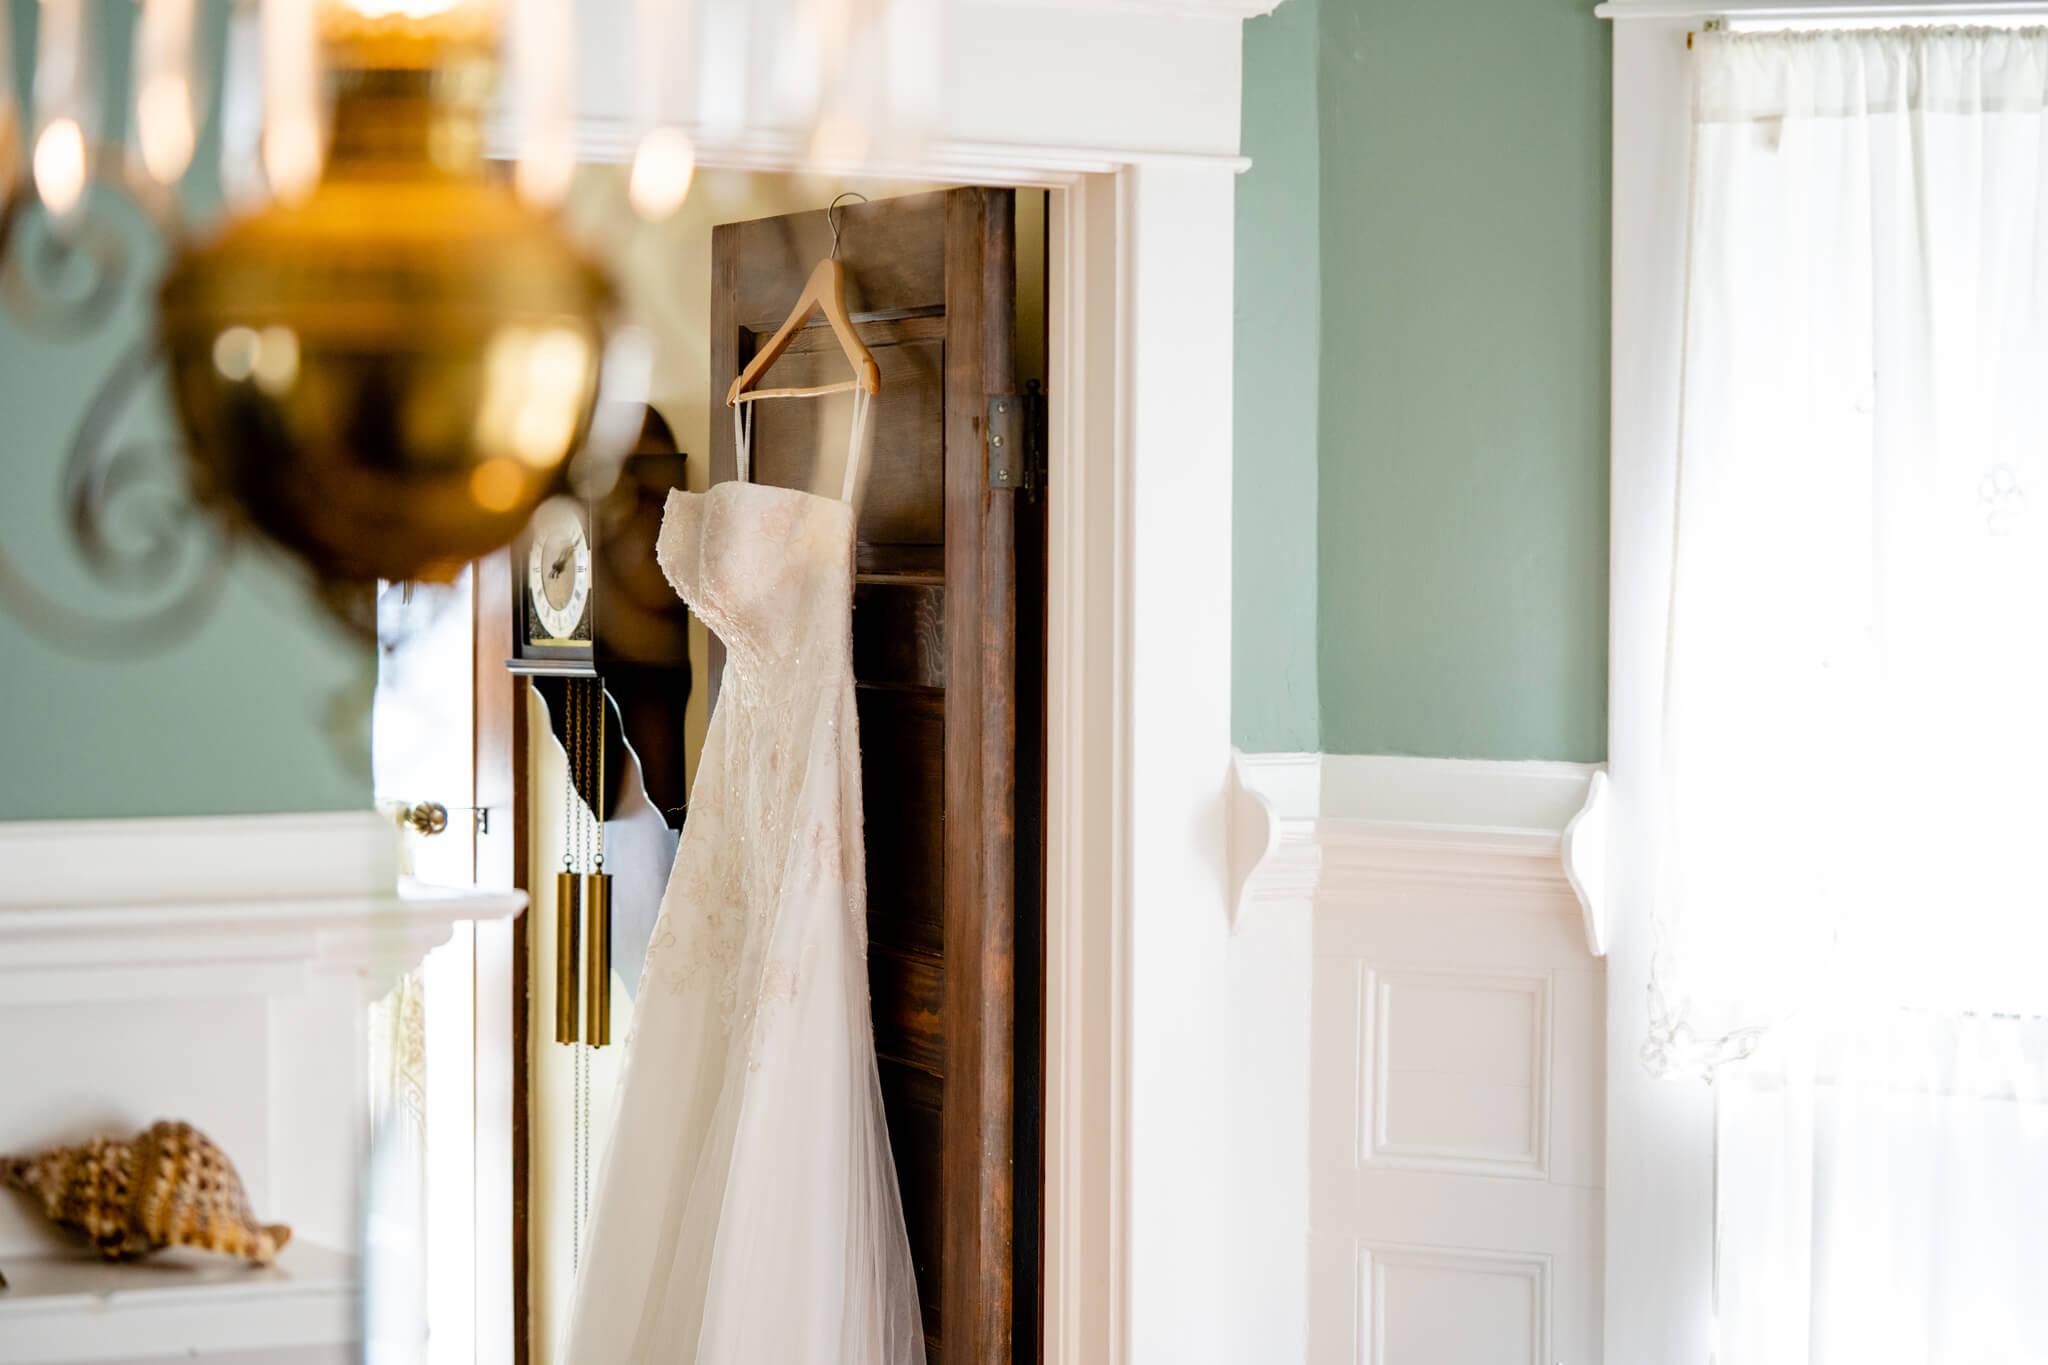 Catherine Laura University of Florida Wedding Smathers Library Reception Baughman Center Ceremony Lake Alice Wedding-6.jpg